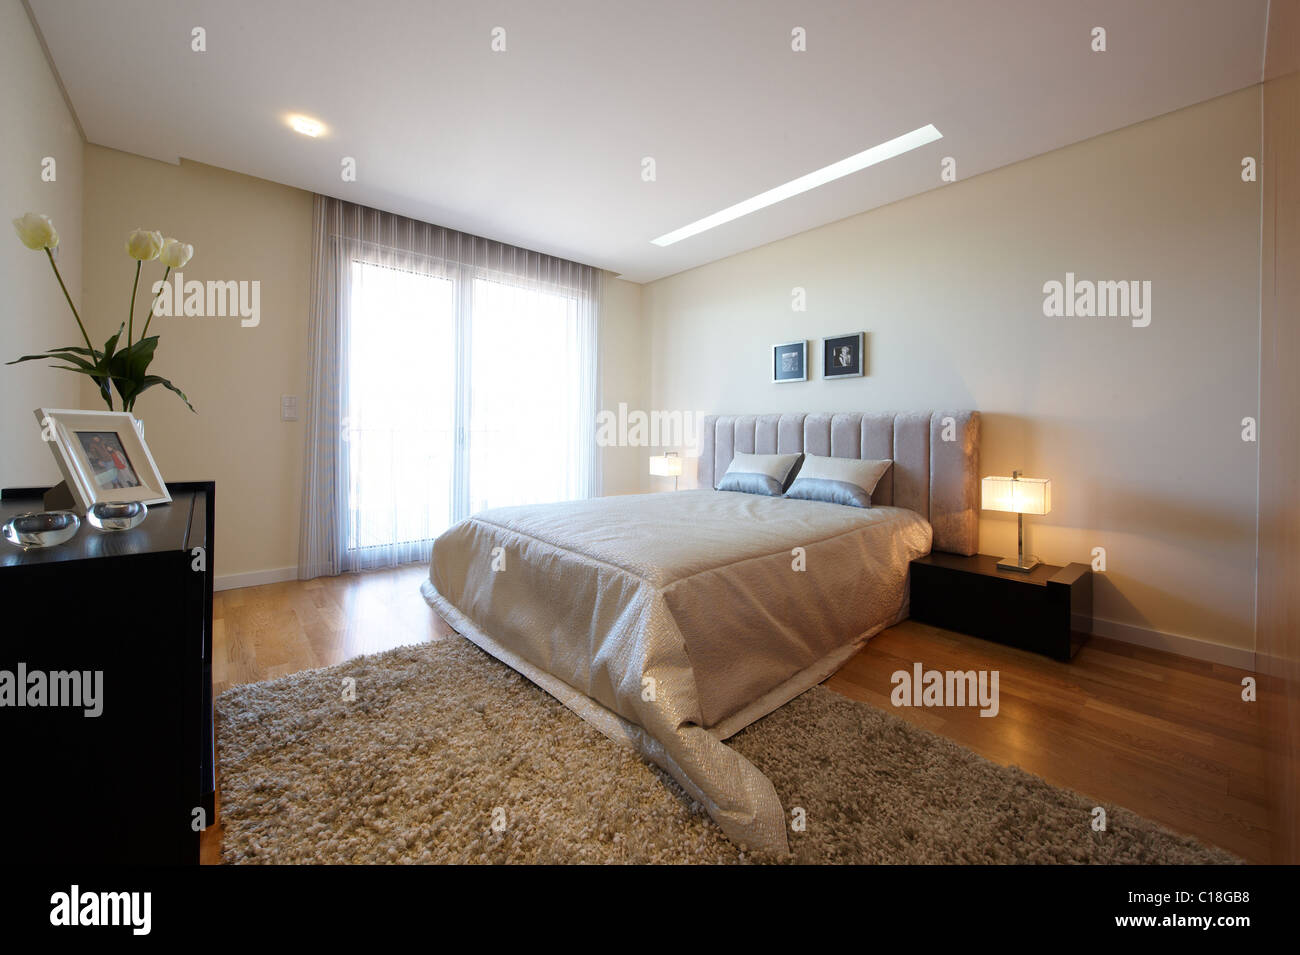 Chambres Photo Stock